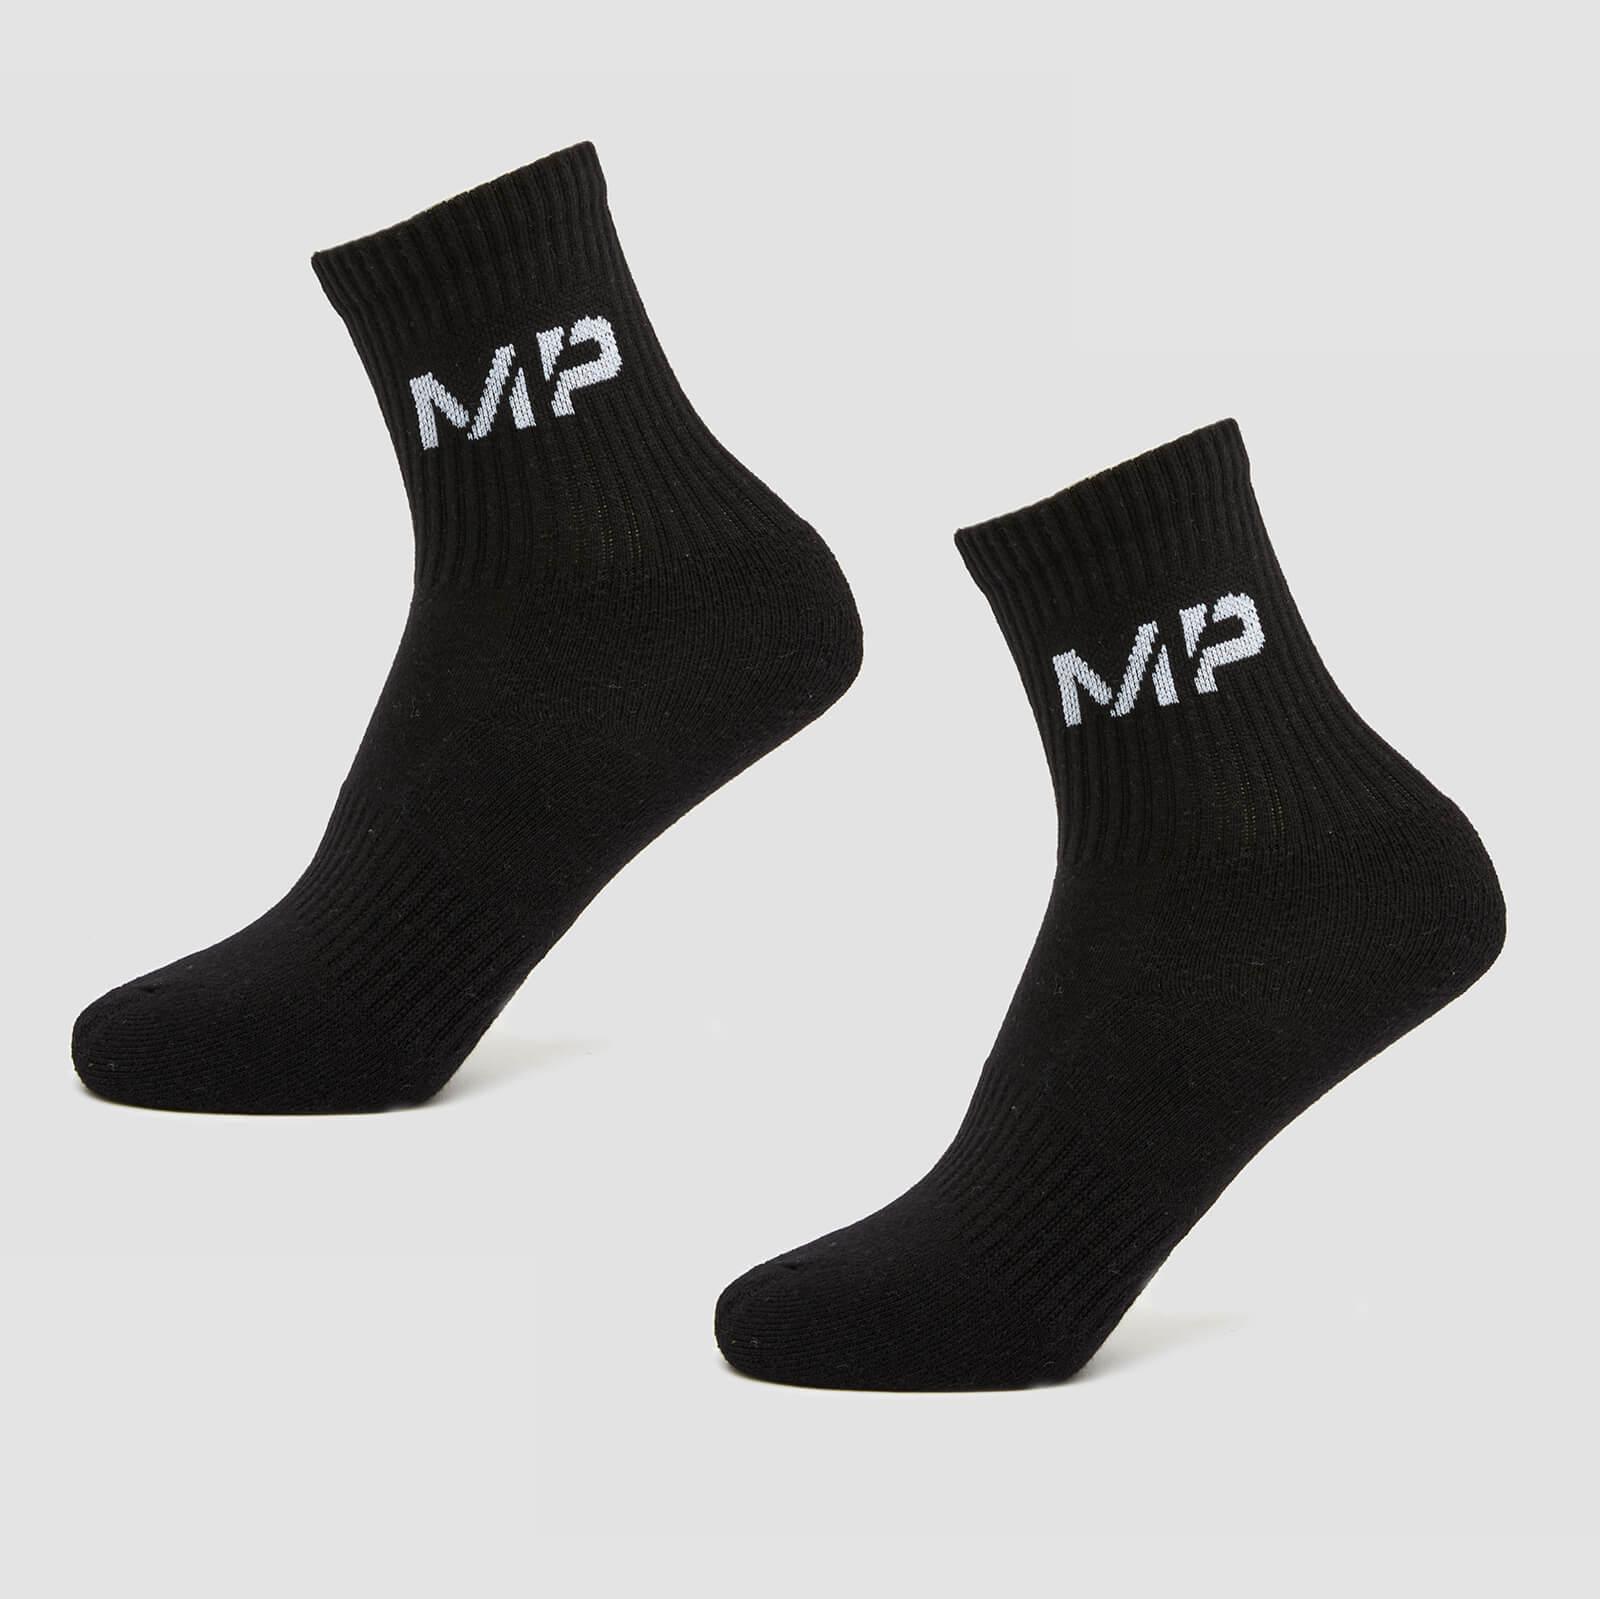 Купить MP Women's Core Crew Socks (2 Pack) Black - UK 3-6, Myprotein International